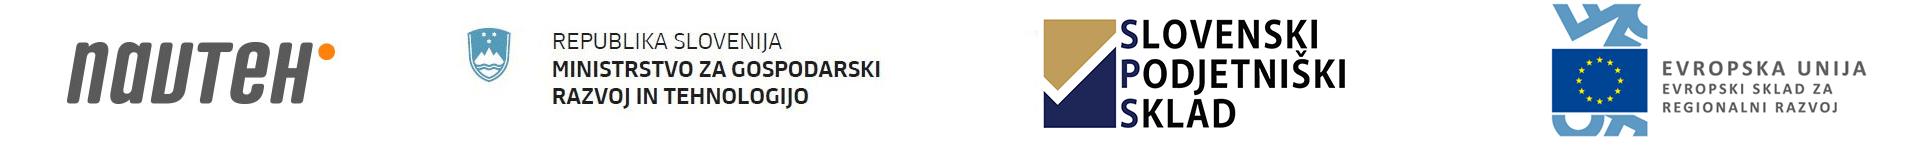 MGRT_SPIRIT_EU_logo-3qs-lohog-sdfvc